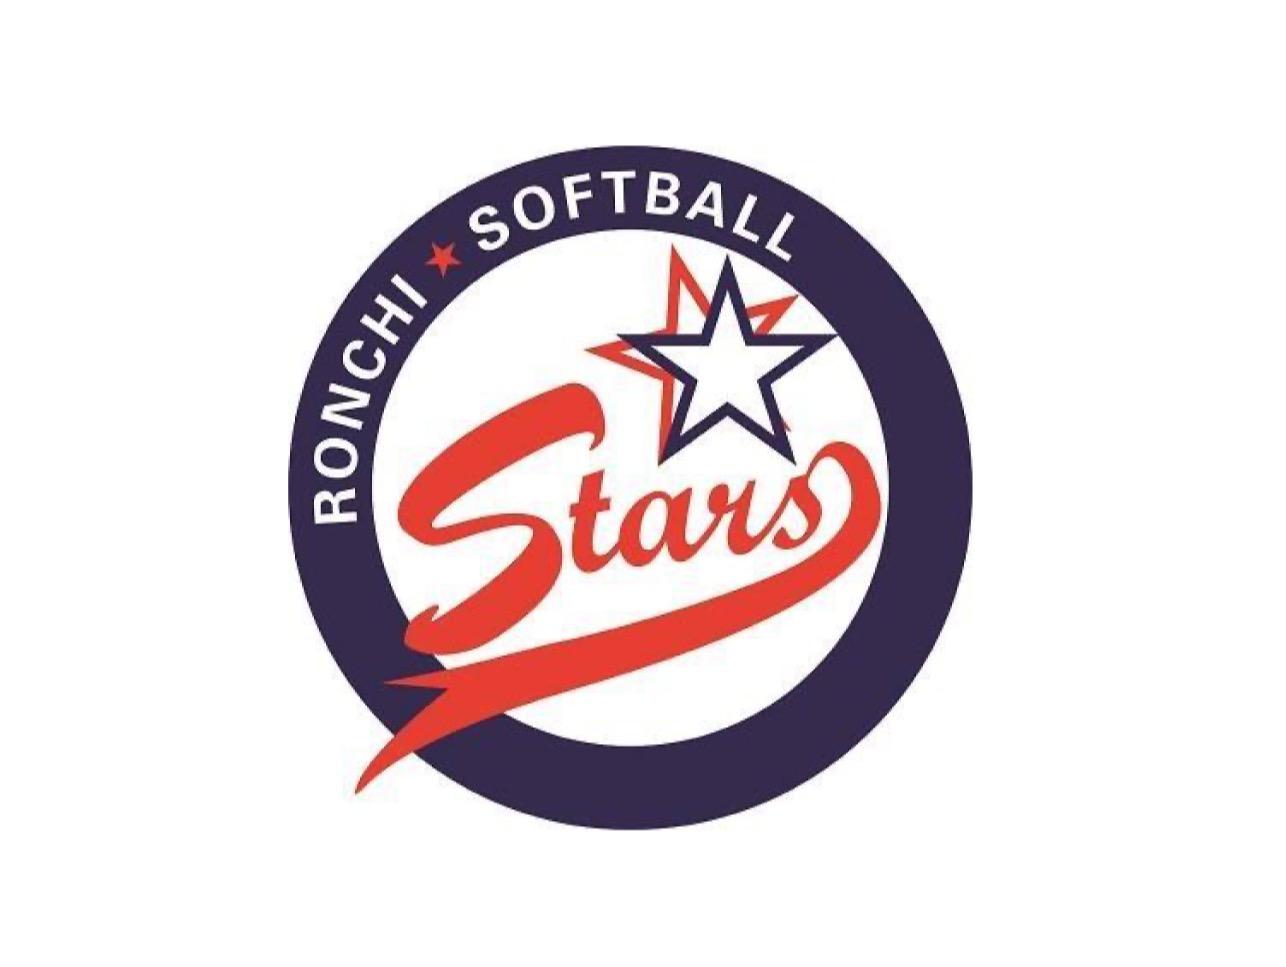 A.S.D. Stars Ronchi Softball Club flag